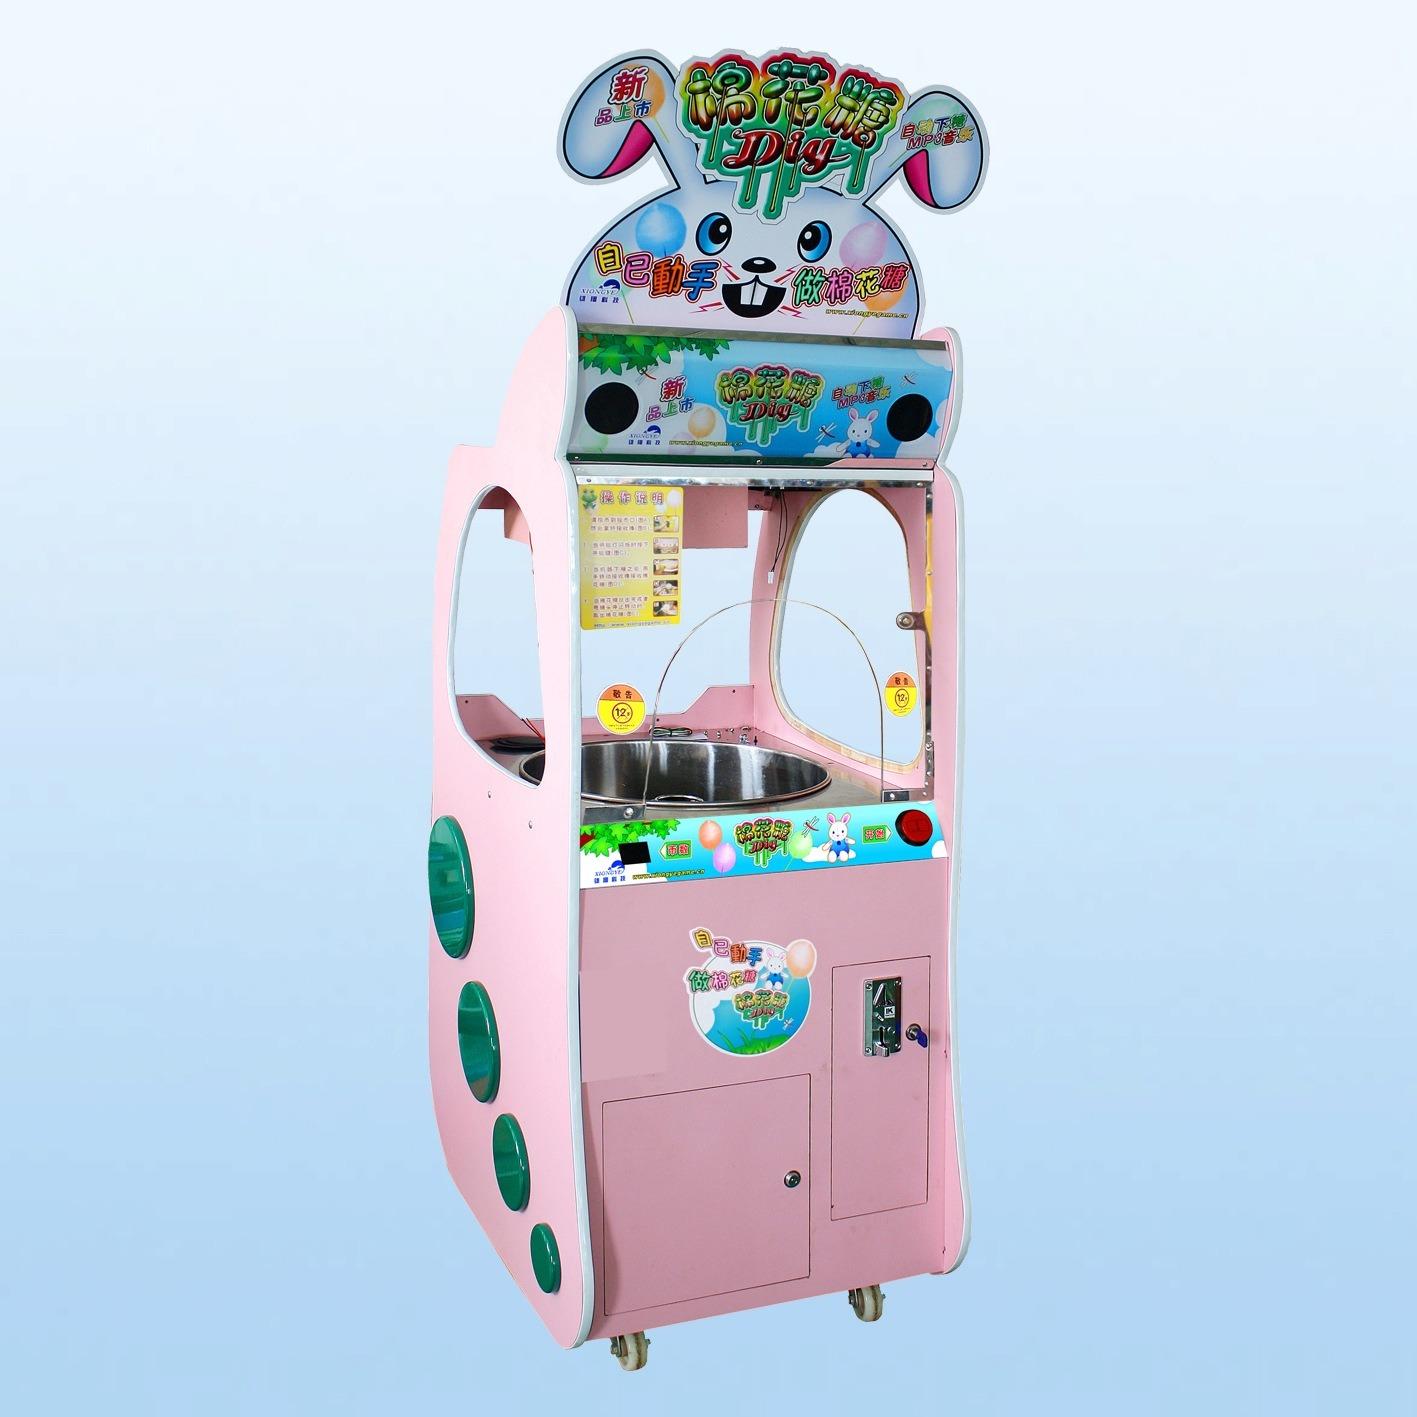 seaga vending machine hack